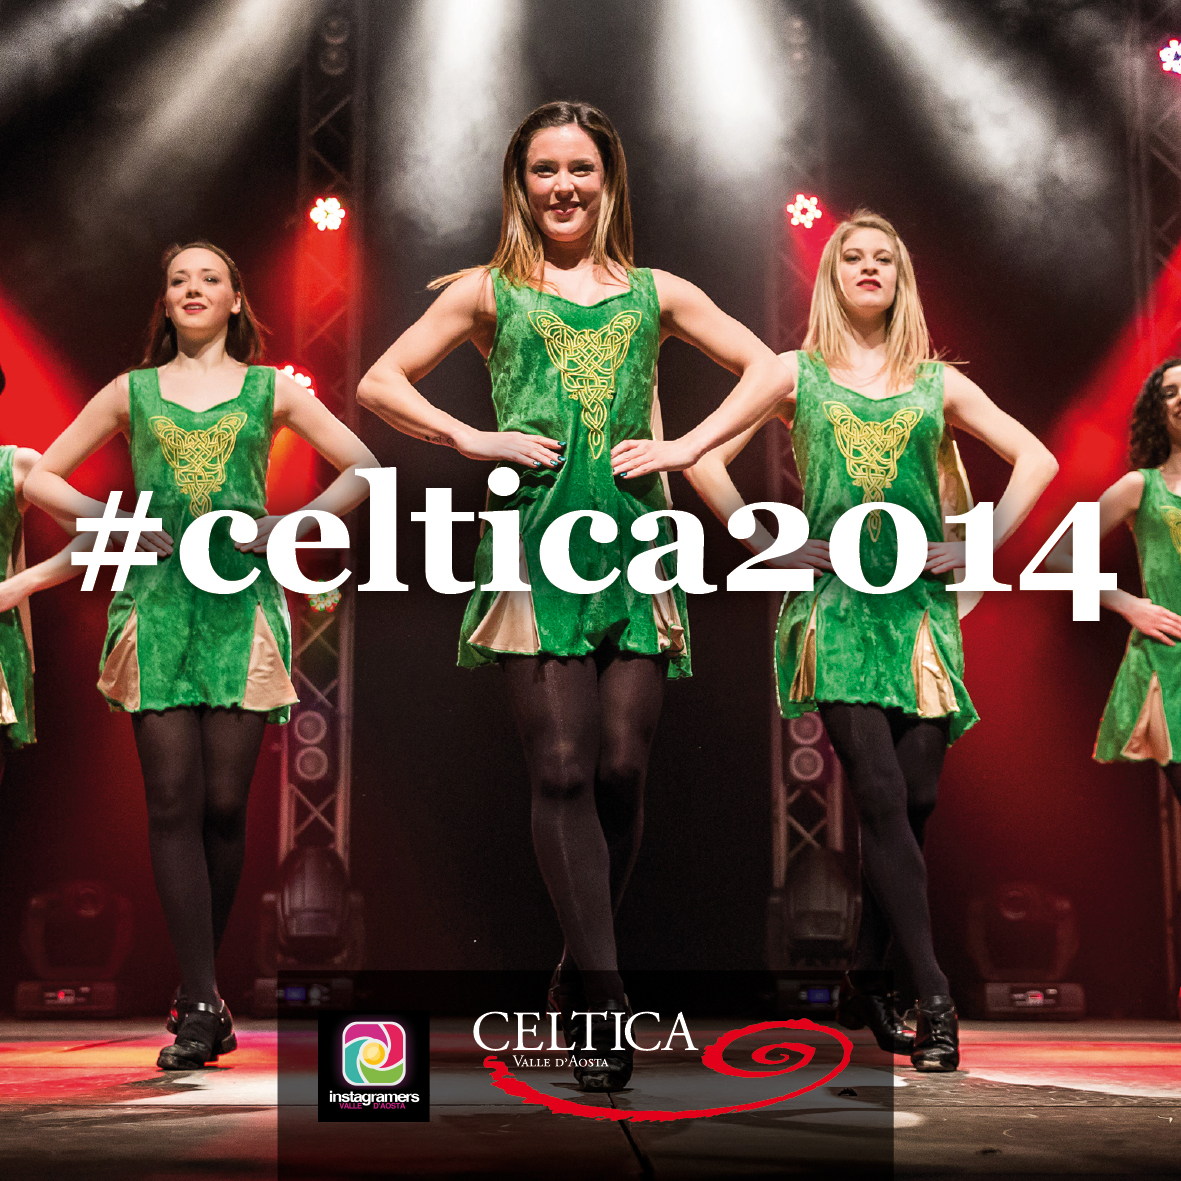 Celtica2014